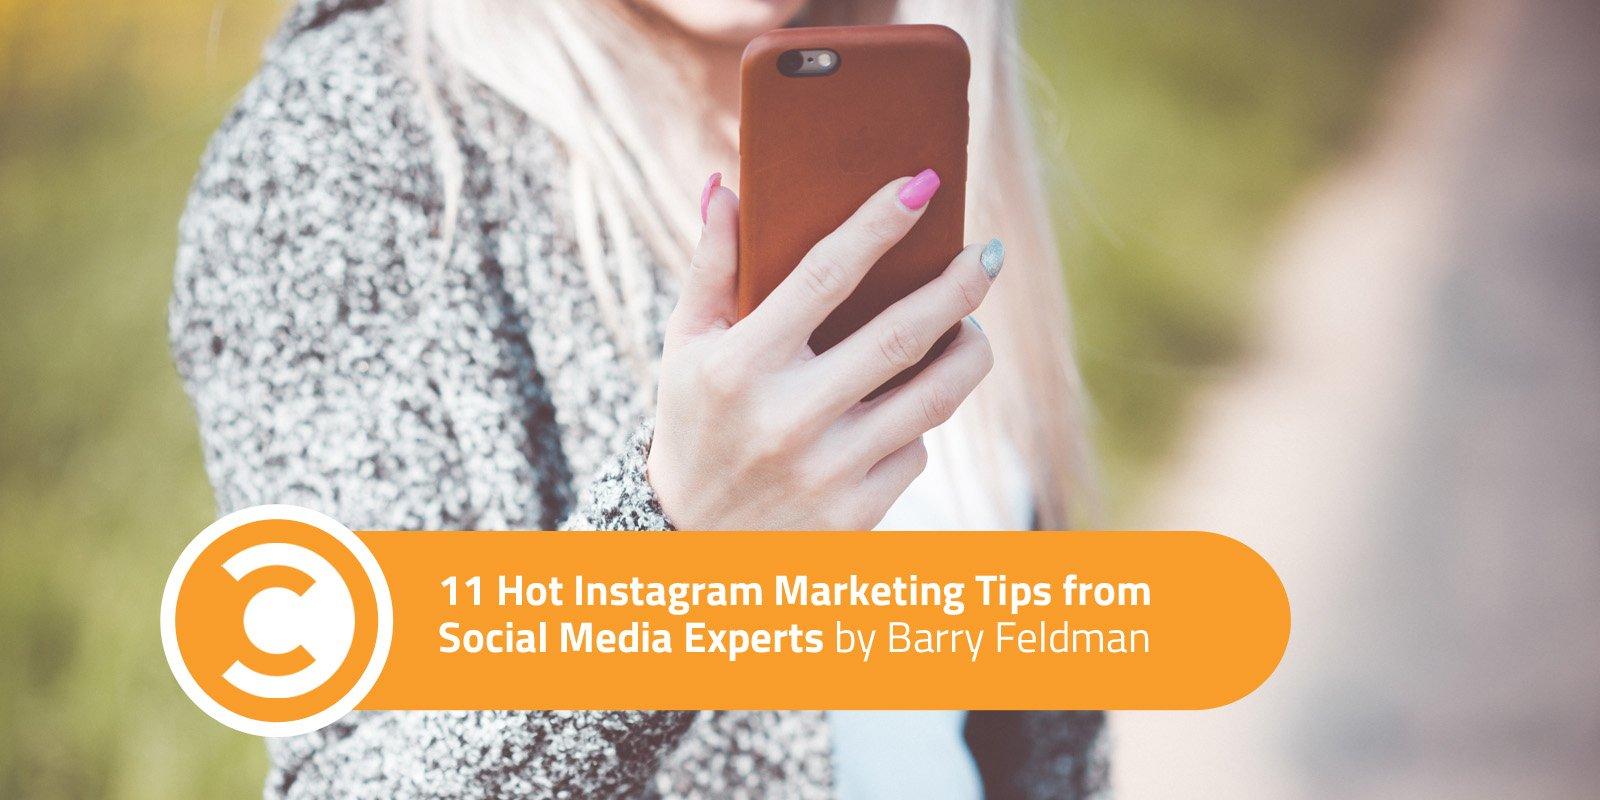 11 Hot Instagram Marketing Tips from Social Media Experts